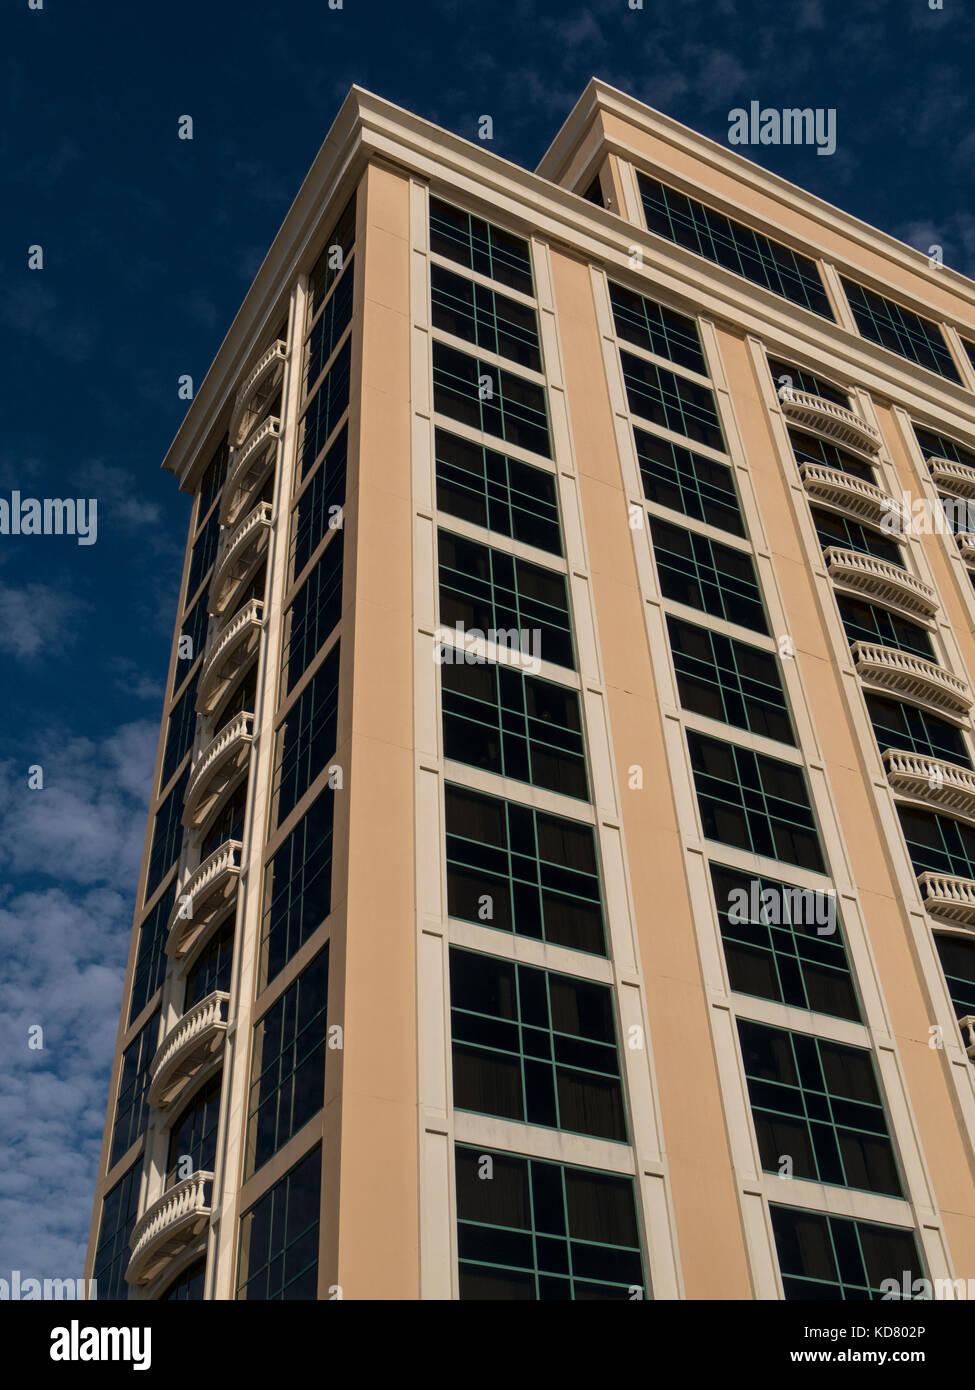 Beau Rivage Casino Hotel Biloxi Mississippi Stock Photo Alamy